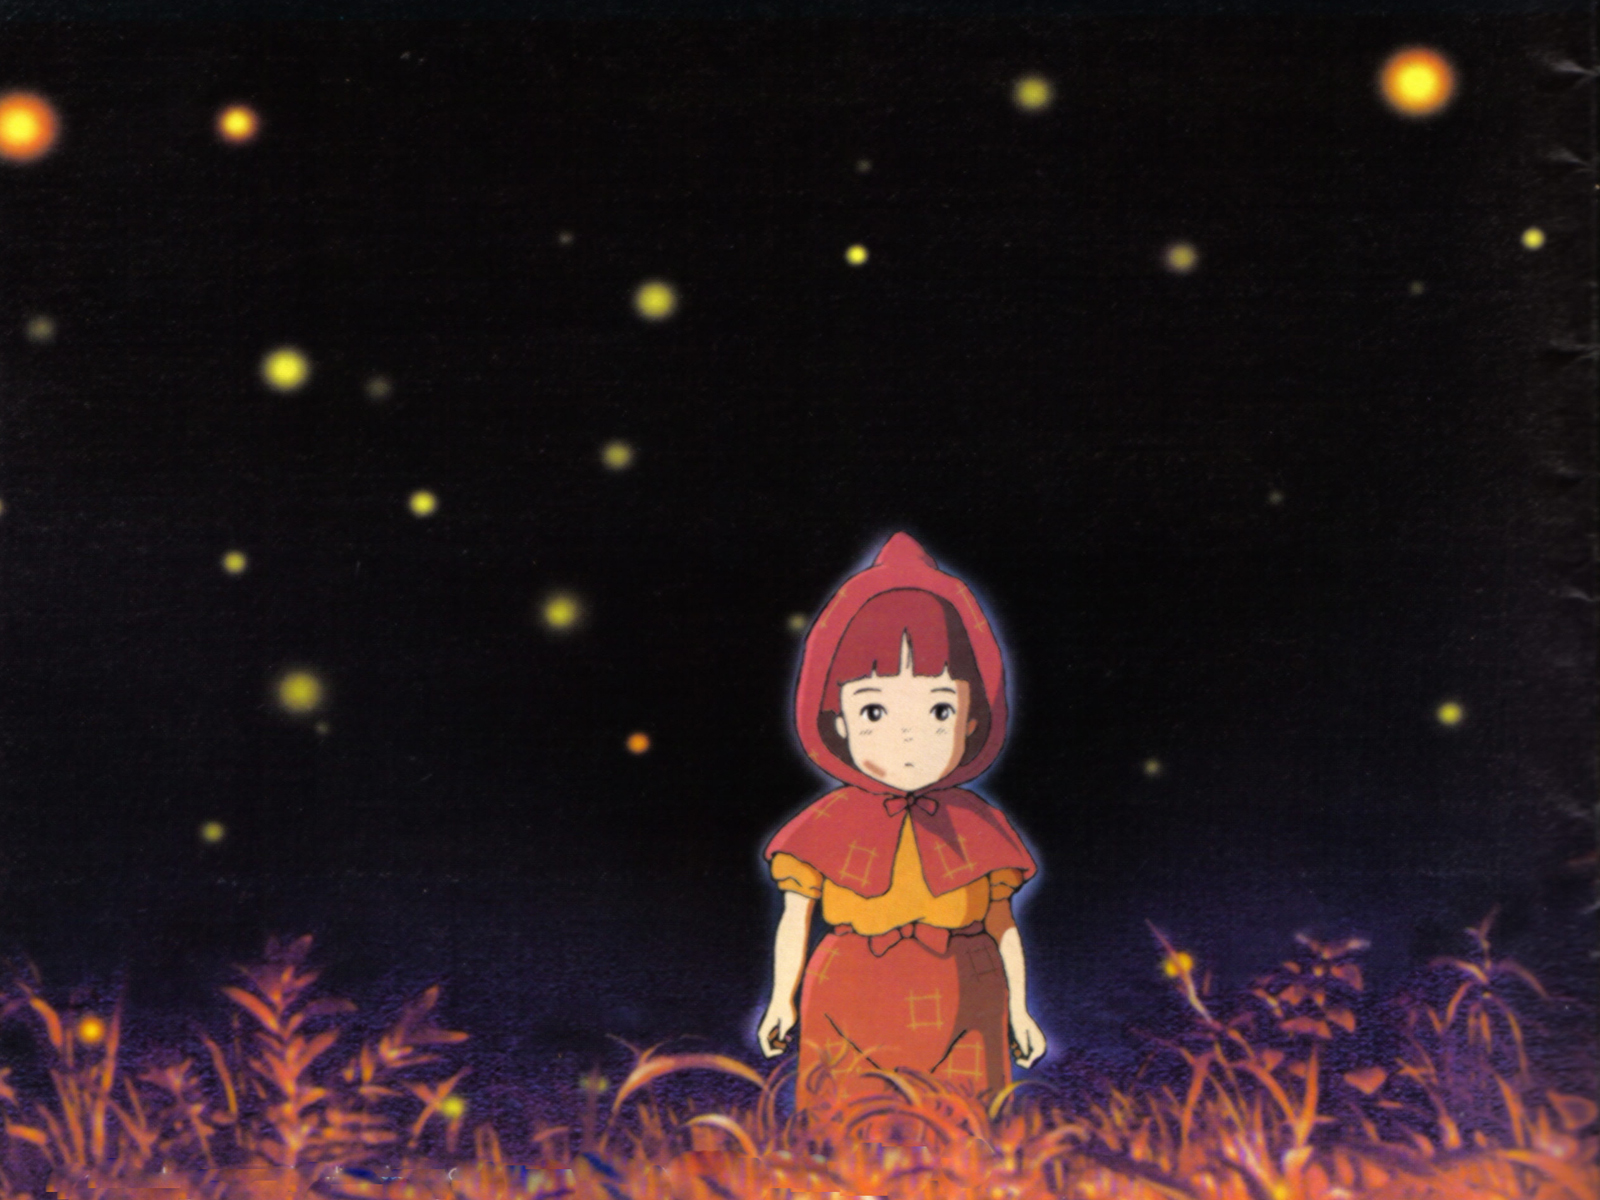 Grave Of Fireflies Studio Ghibli Wallpaper 27065289